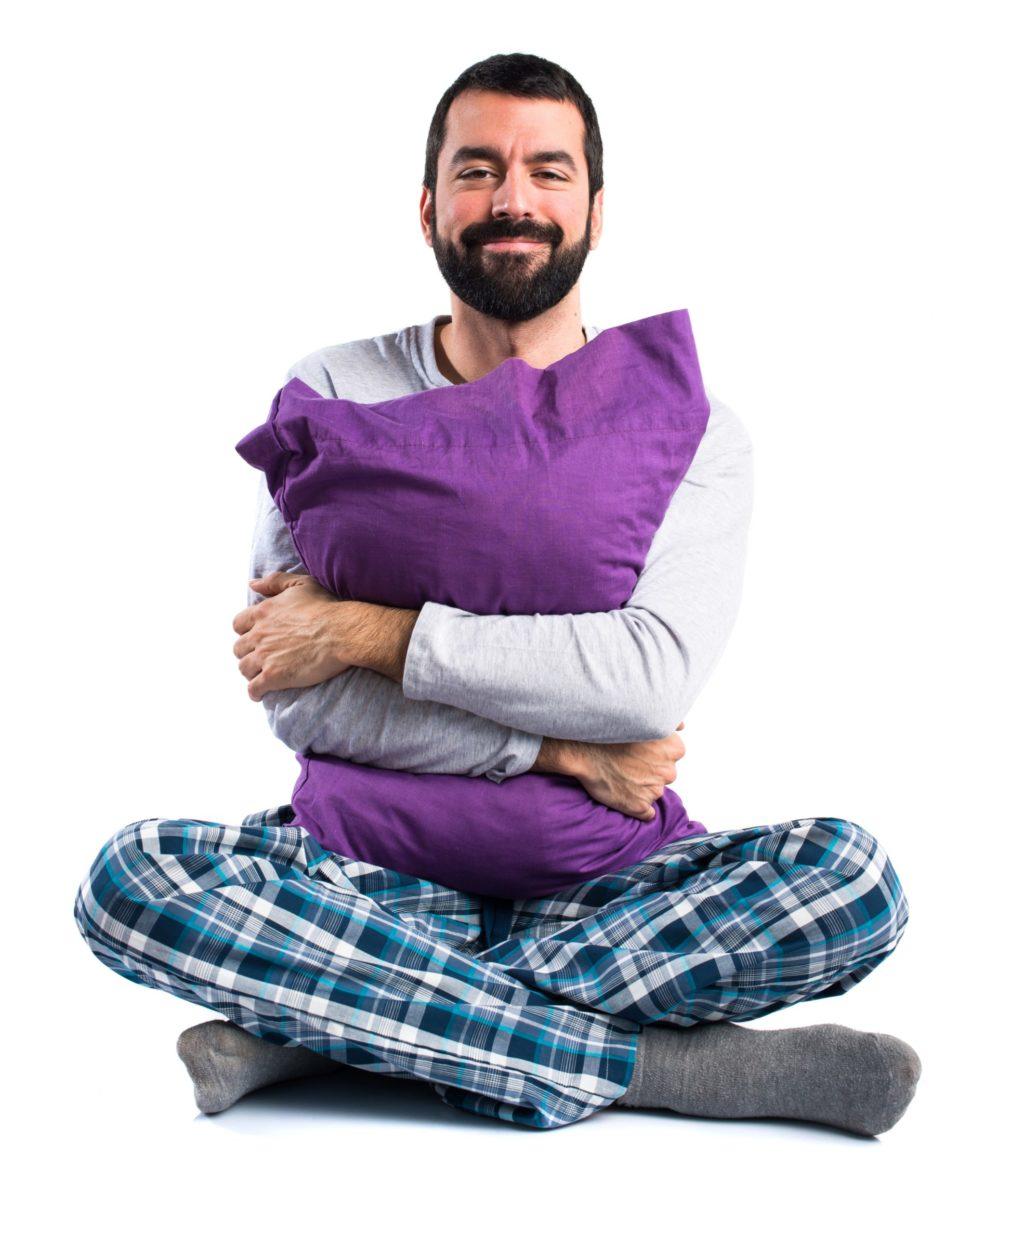 homme heureux en pyjama qui a bien dormi